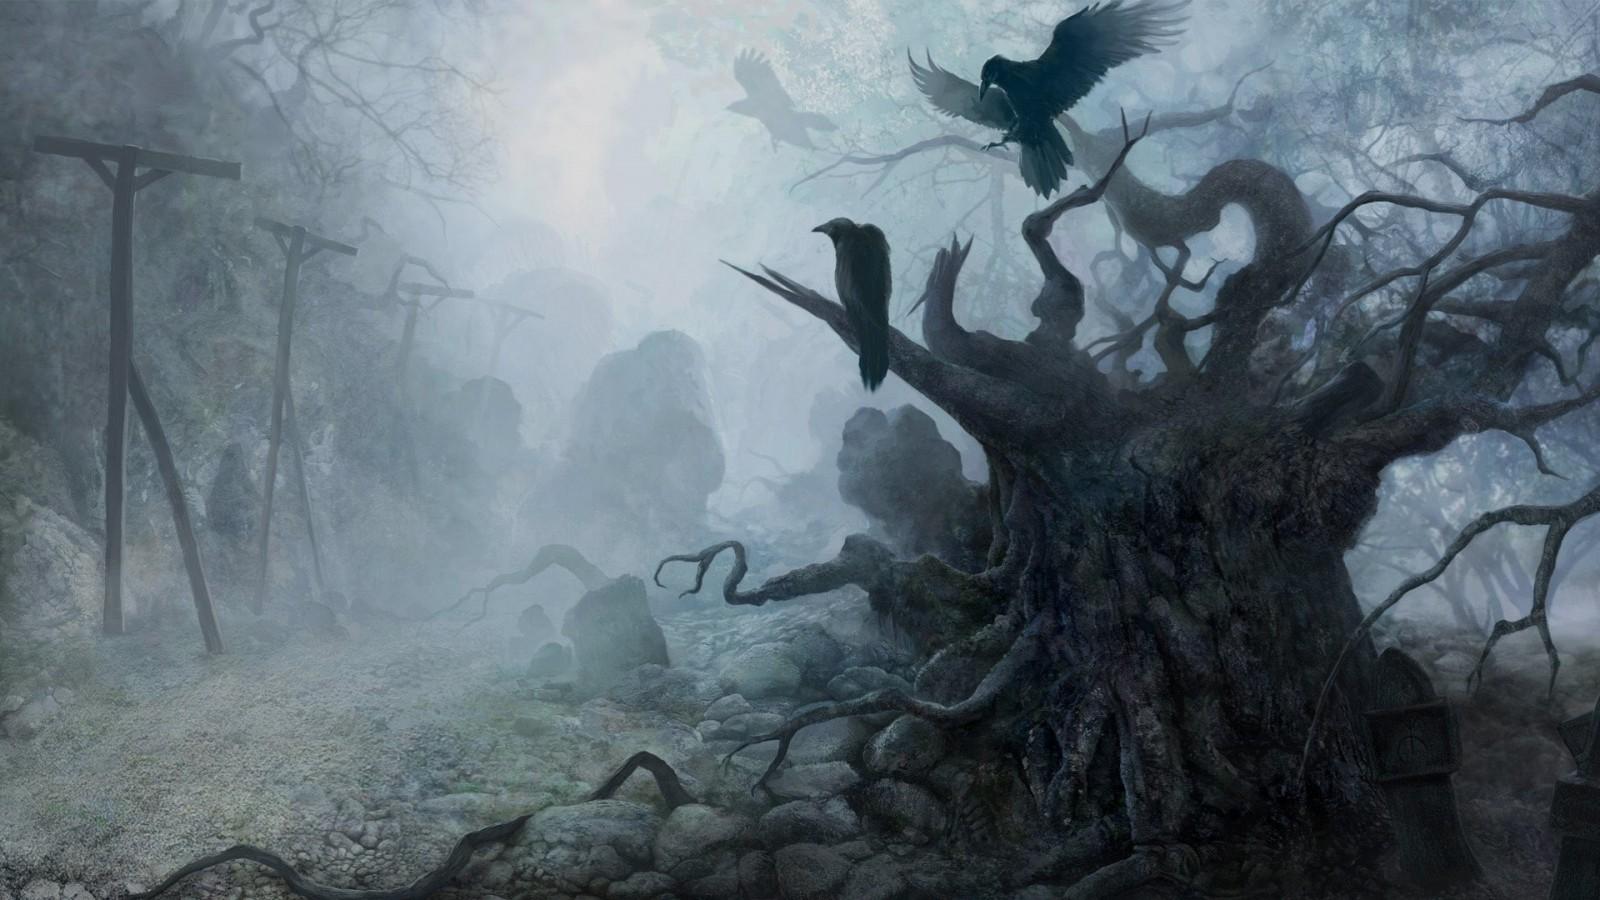 1920x1080_px_creepy_Dead_Trees_horror-83